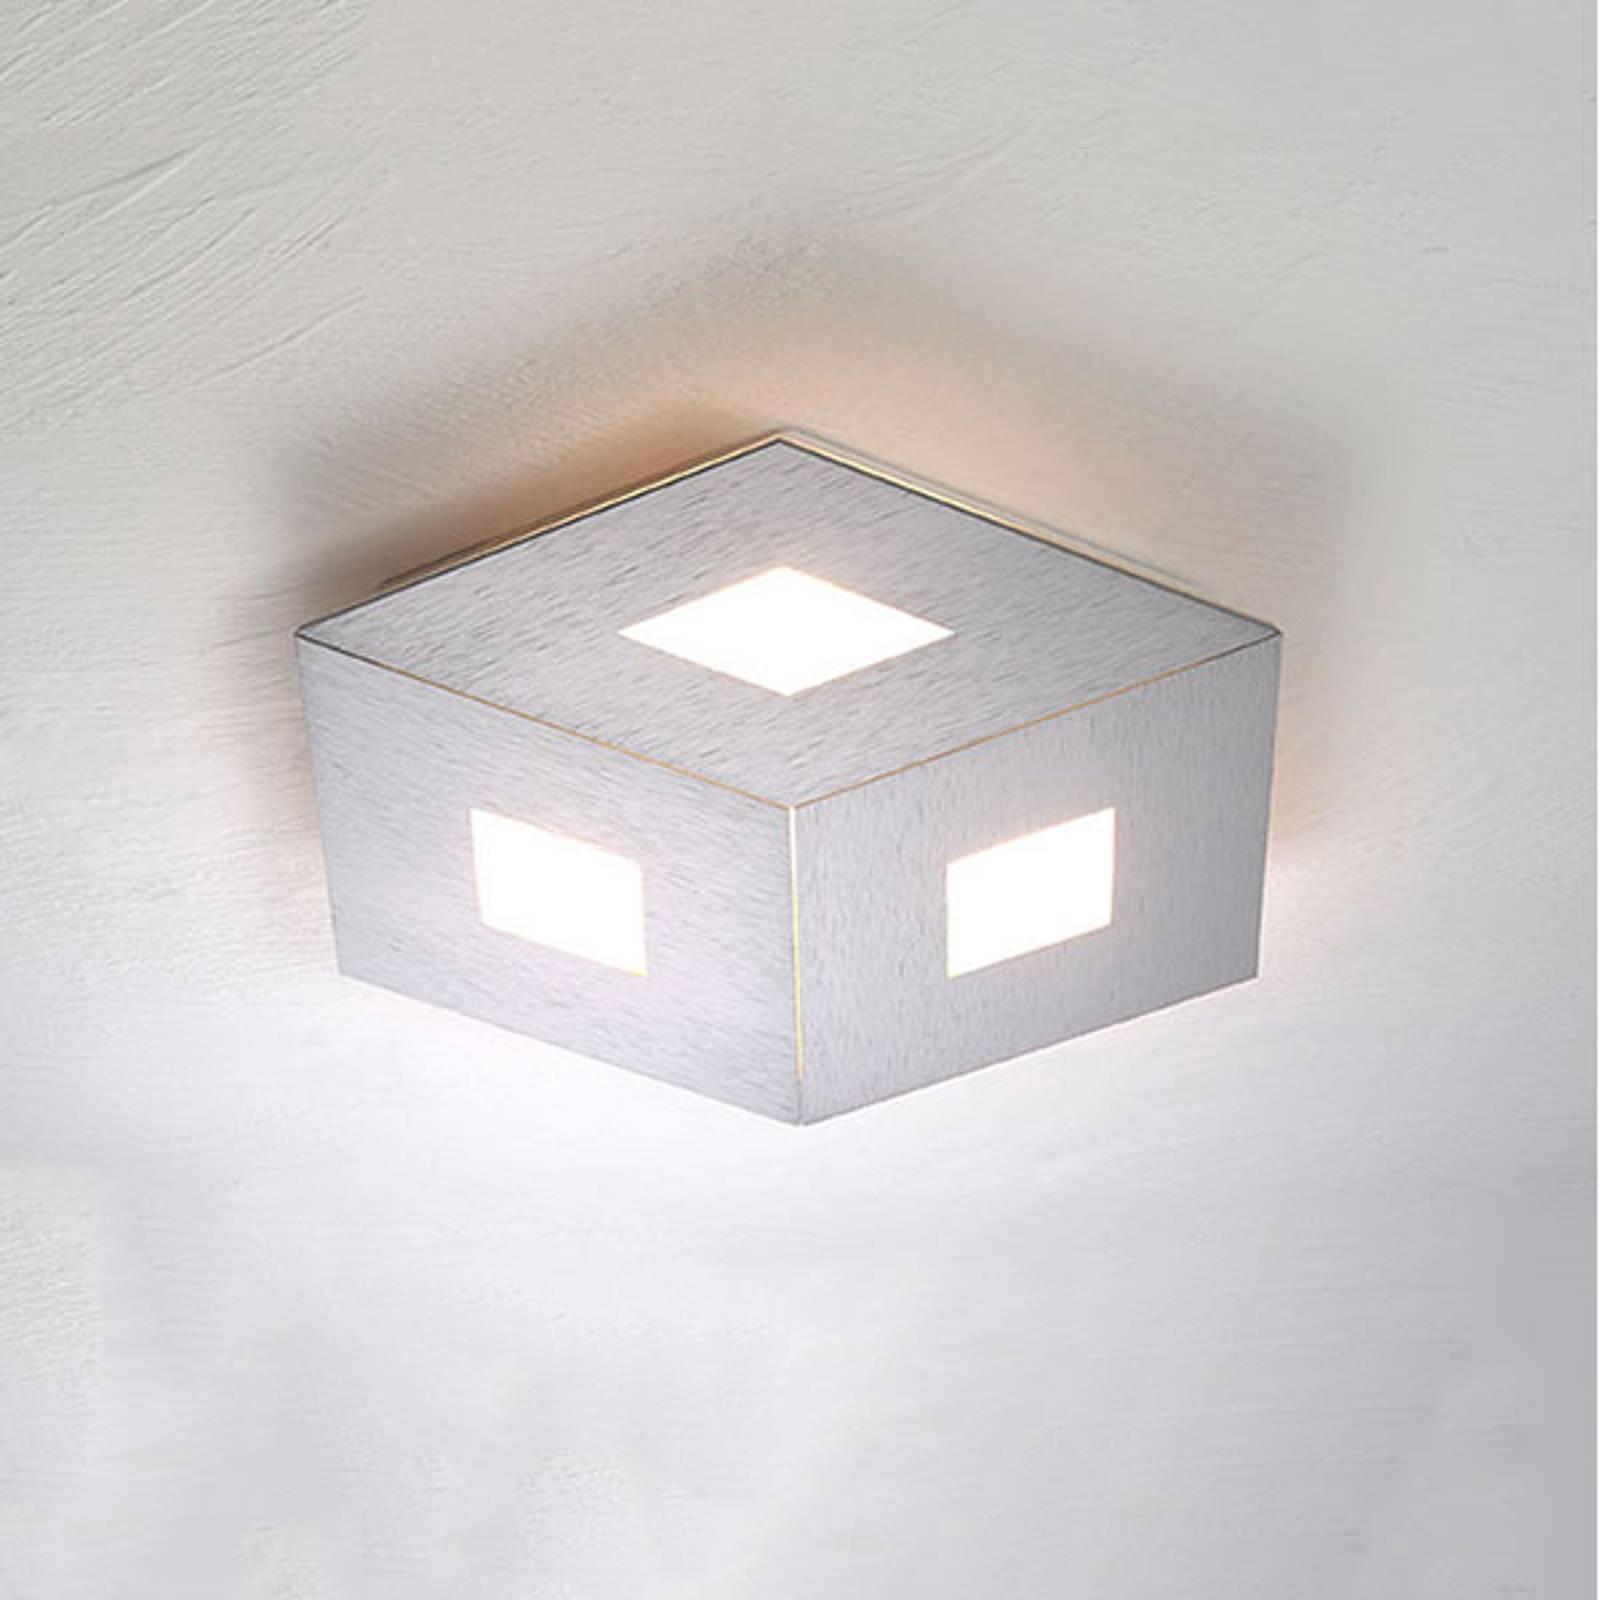 Bopp box Comfort LED plafondlamp zilver 35cm